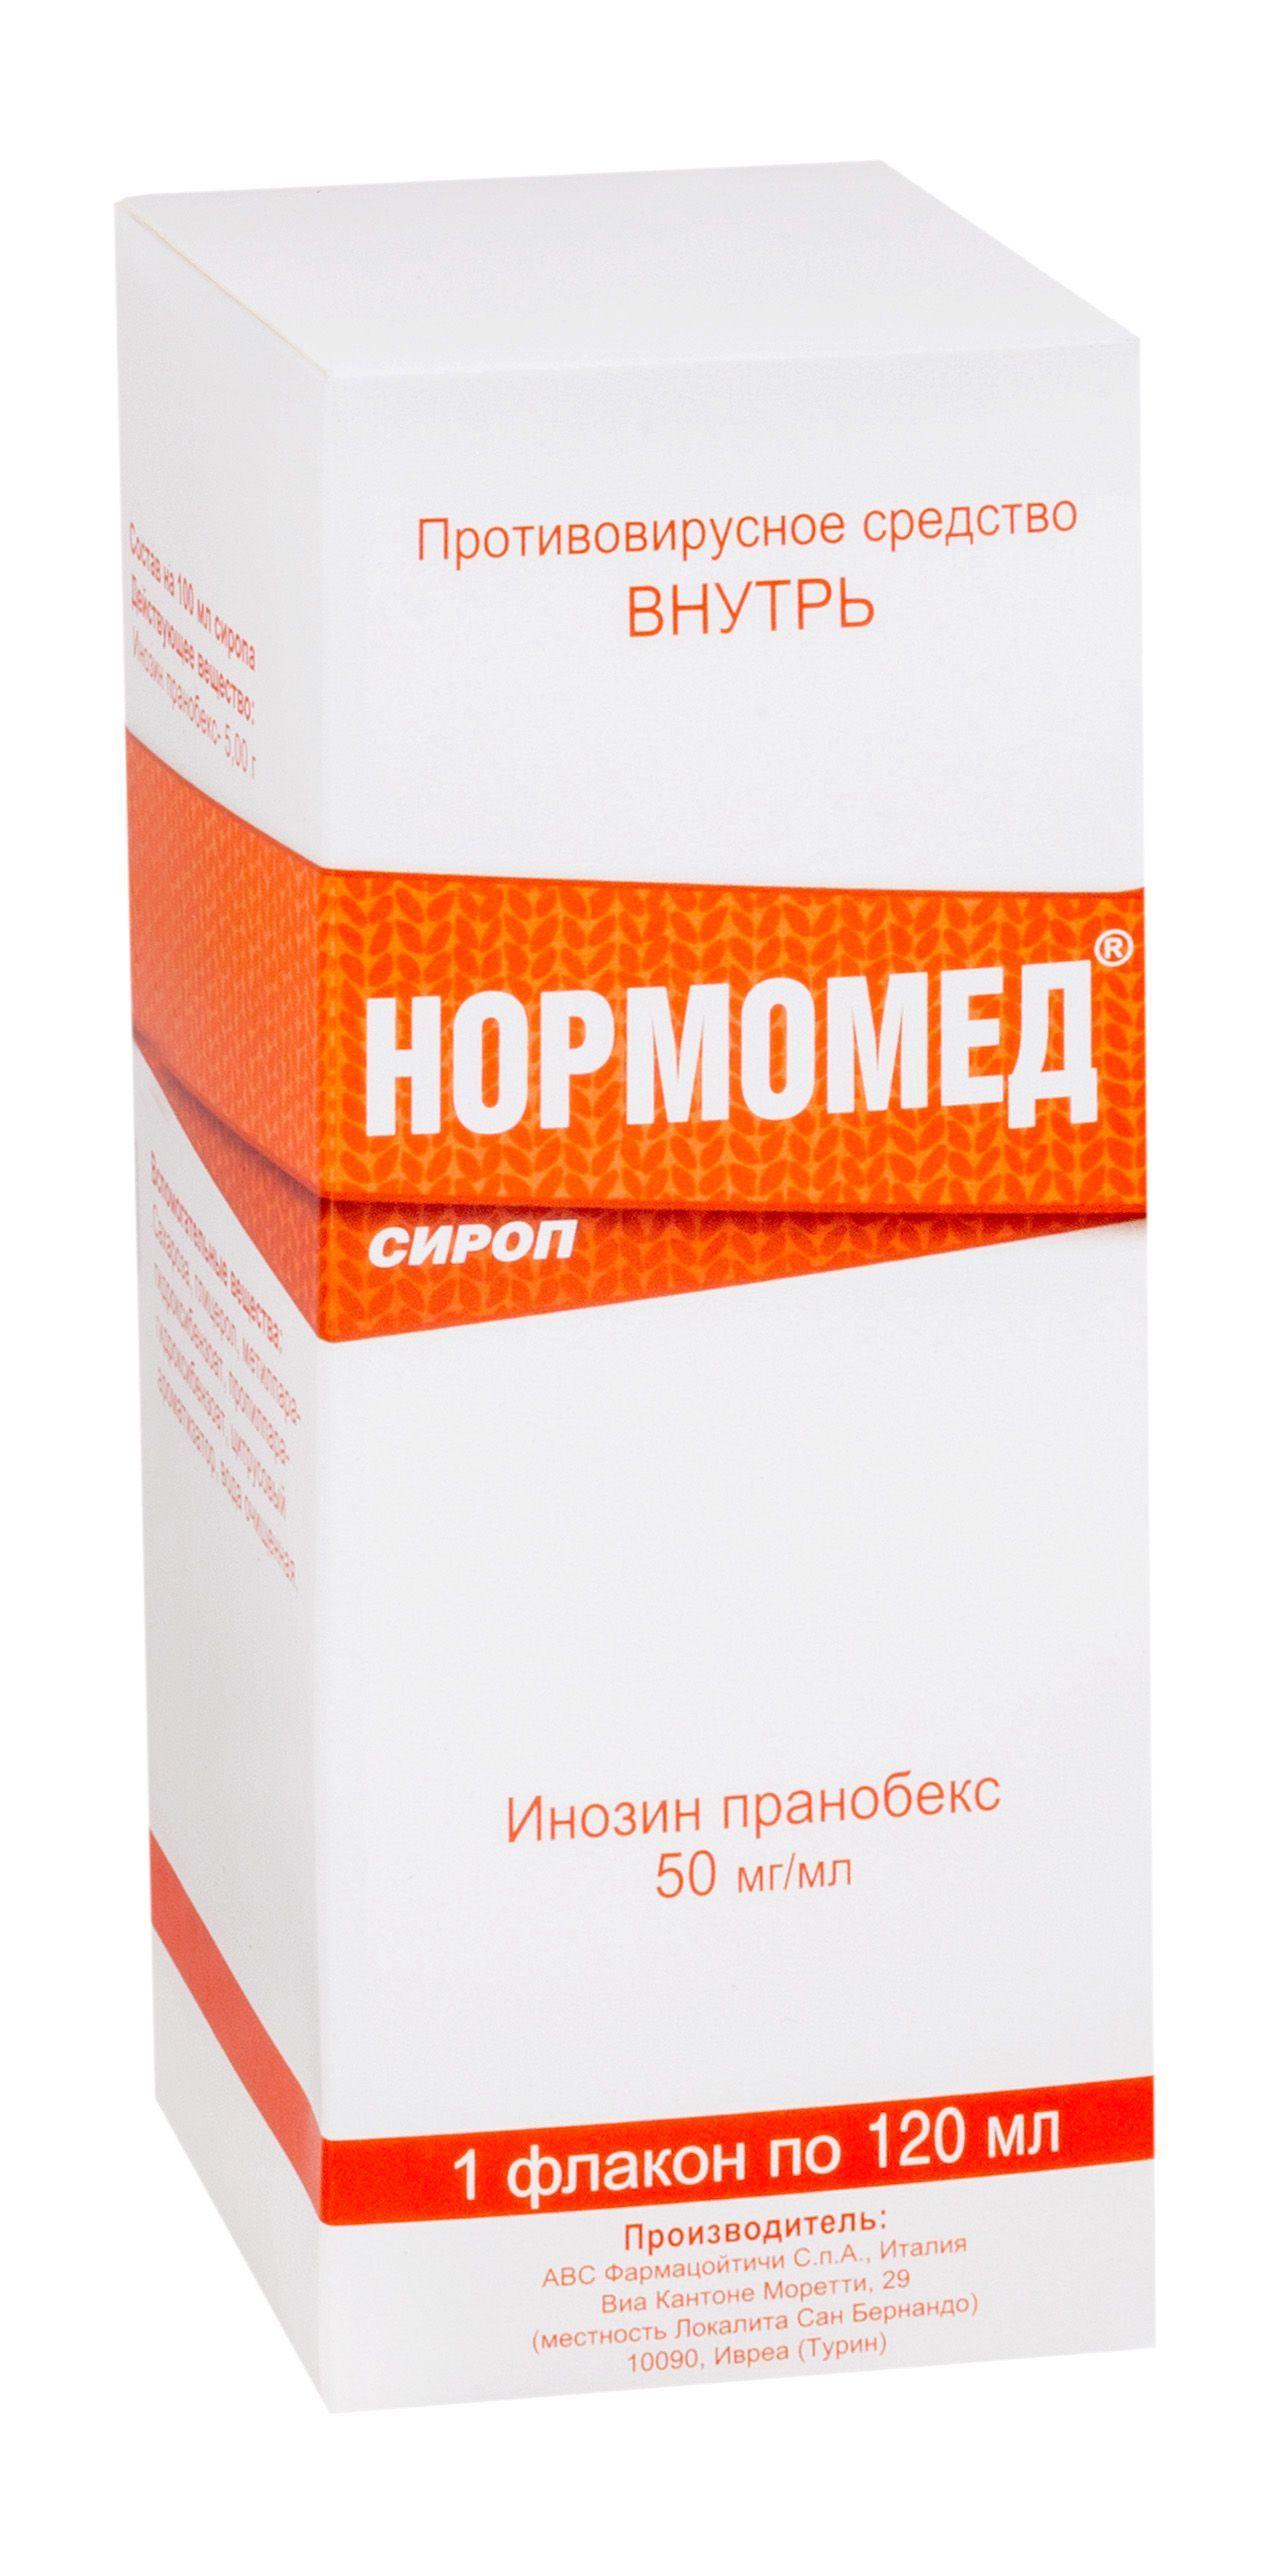 фото упаковки Нормомед